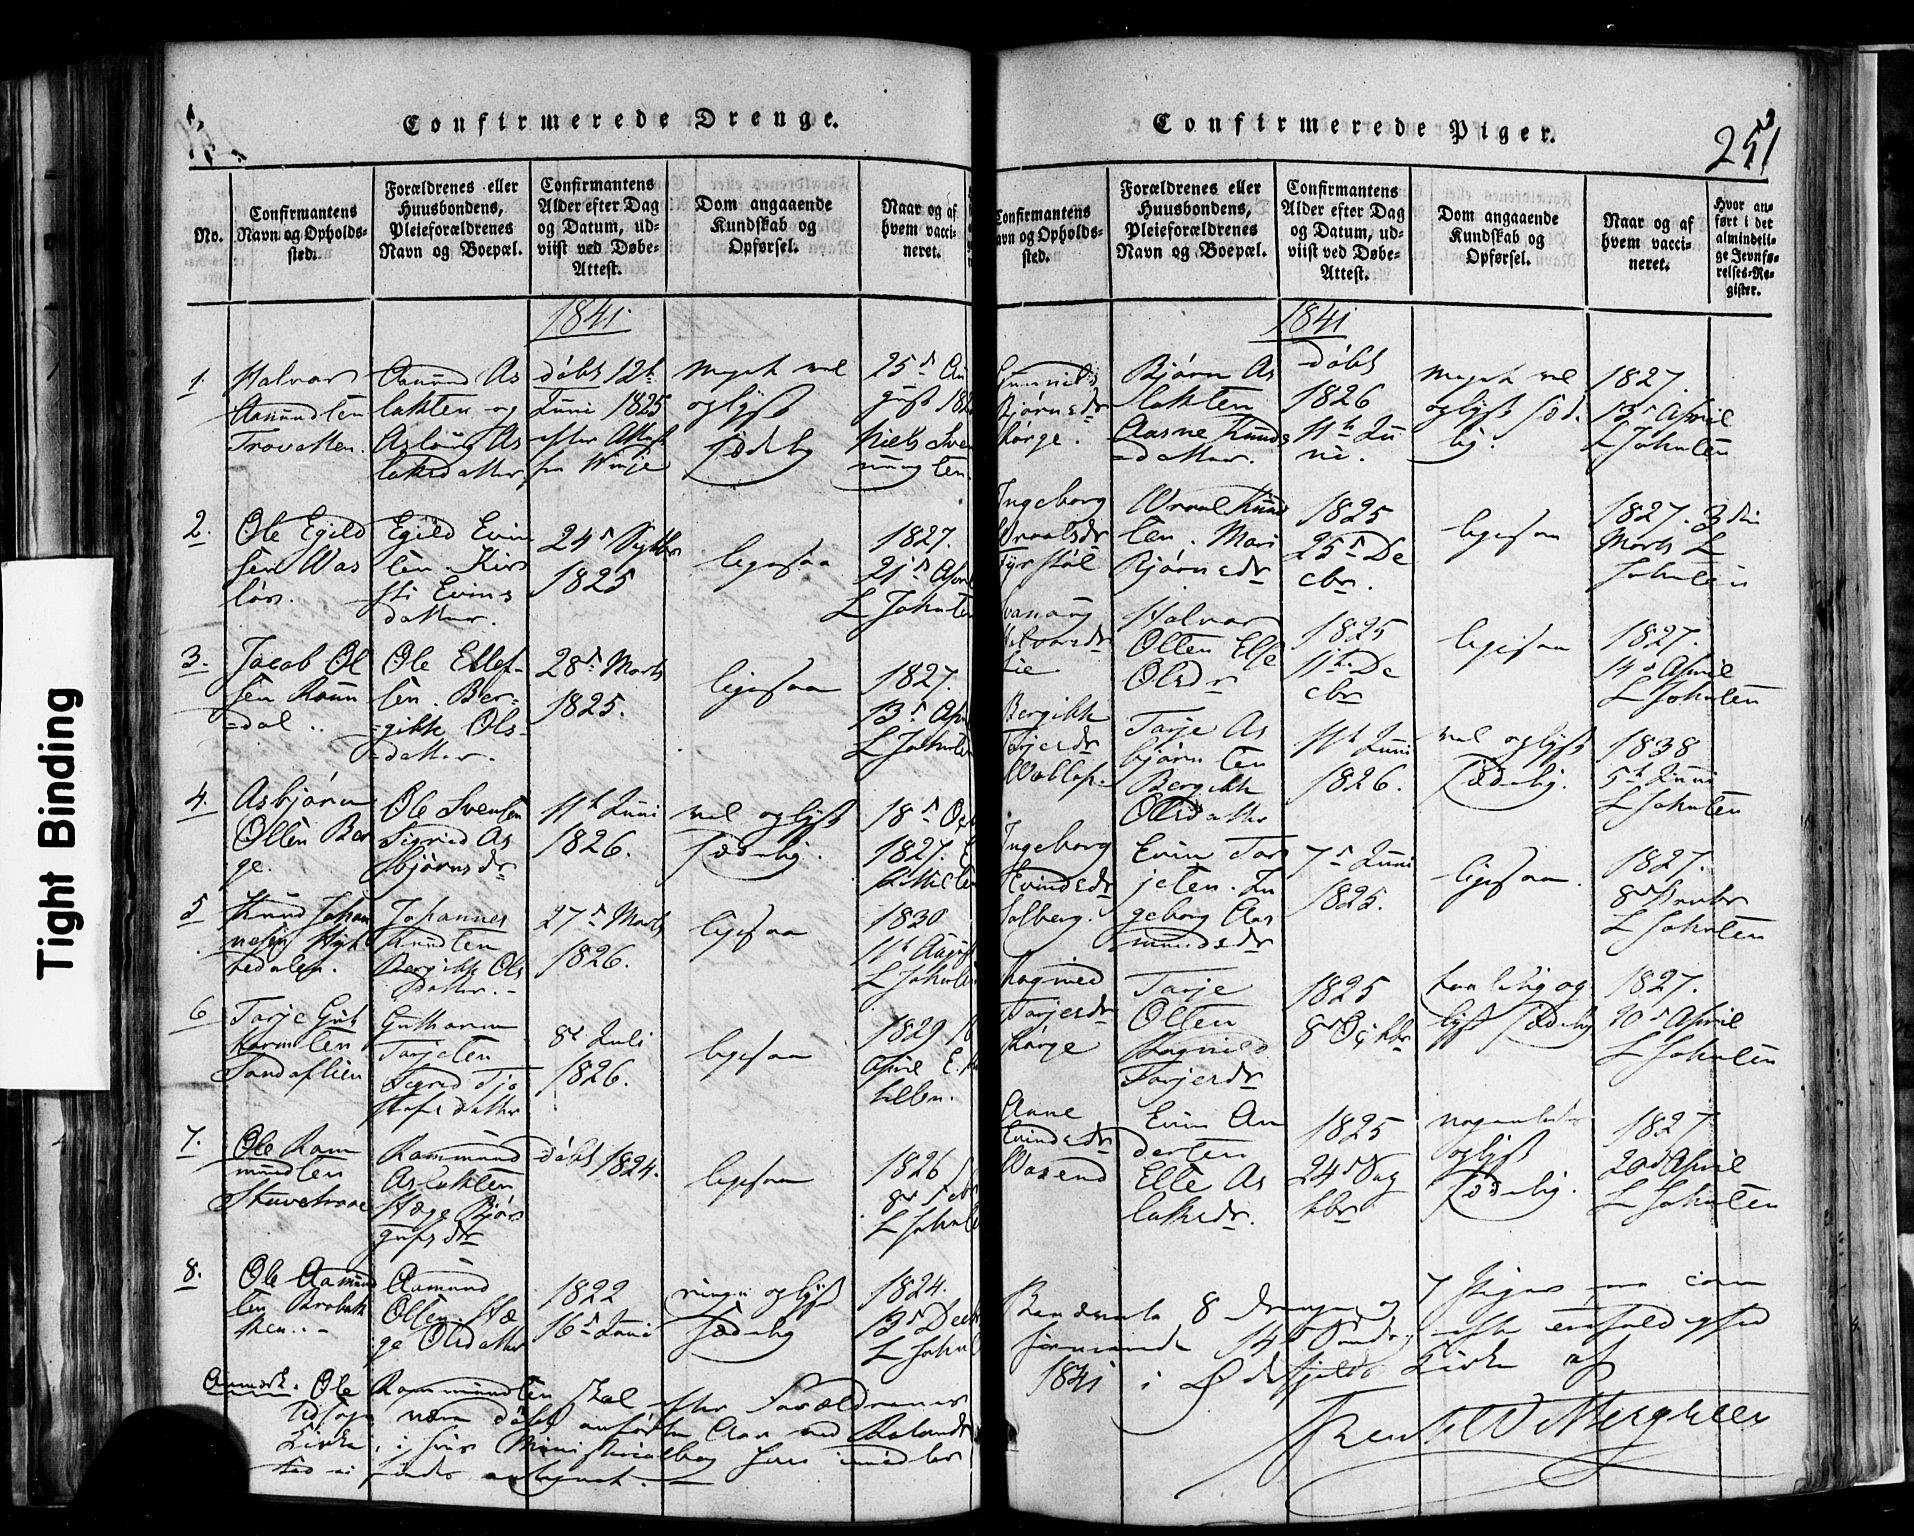 SAKO, Rauland kirkebøker, F/Fa/L0002: Ministerialbok nr. 2, 1815-1860, s. 251